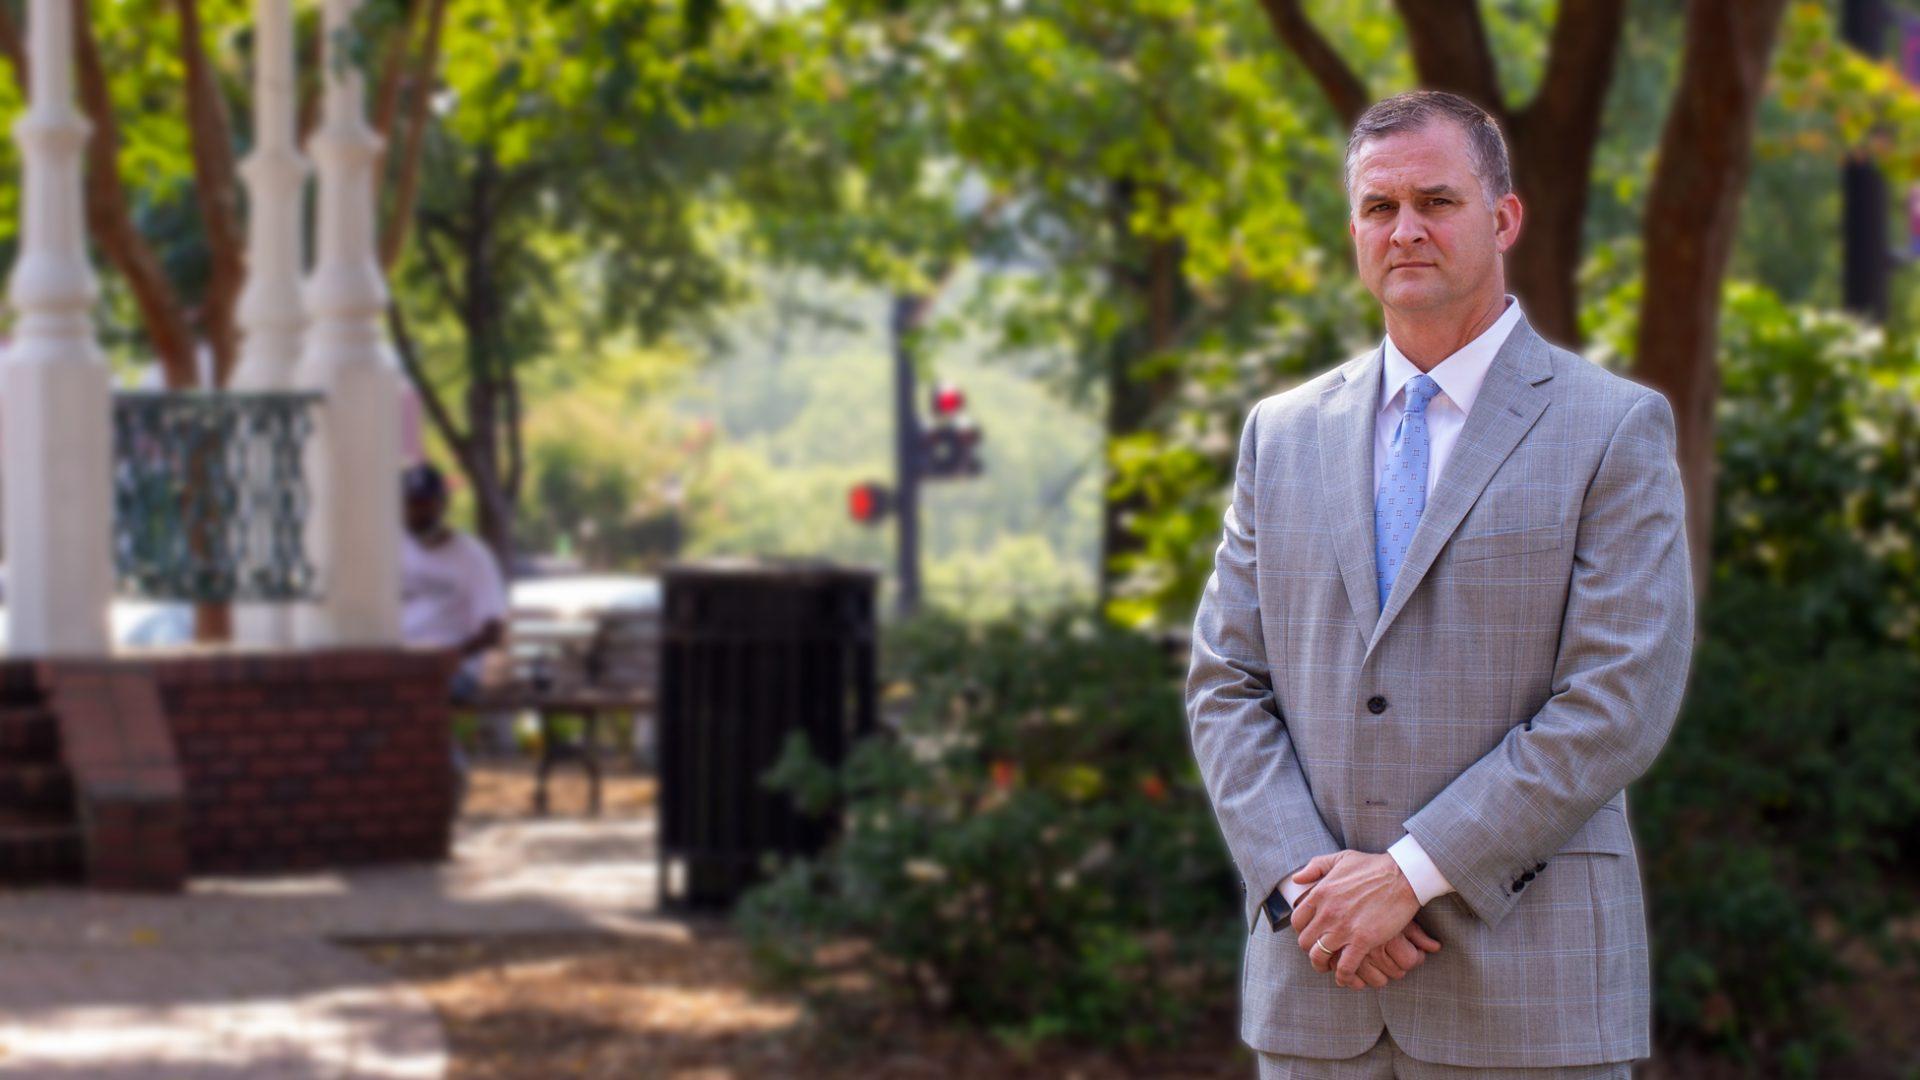 Best Law Firm Website for Atlanta DUI Rich